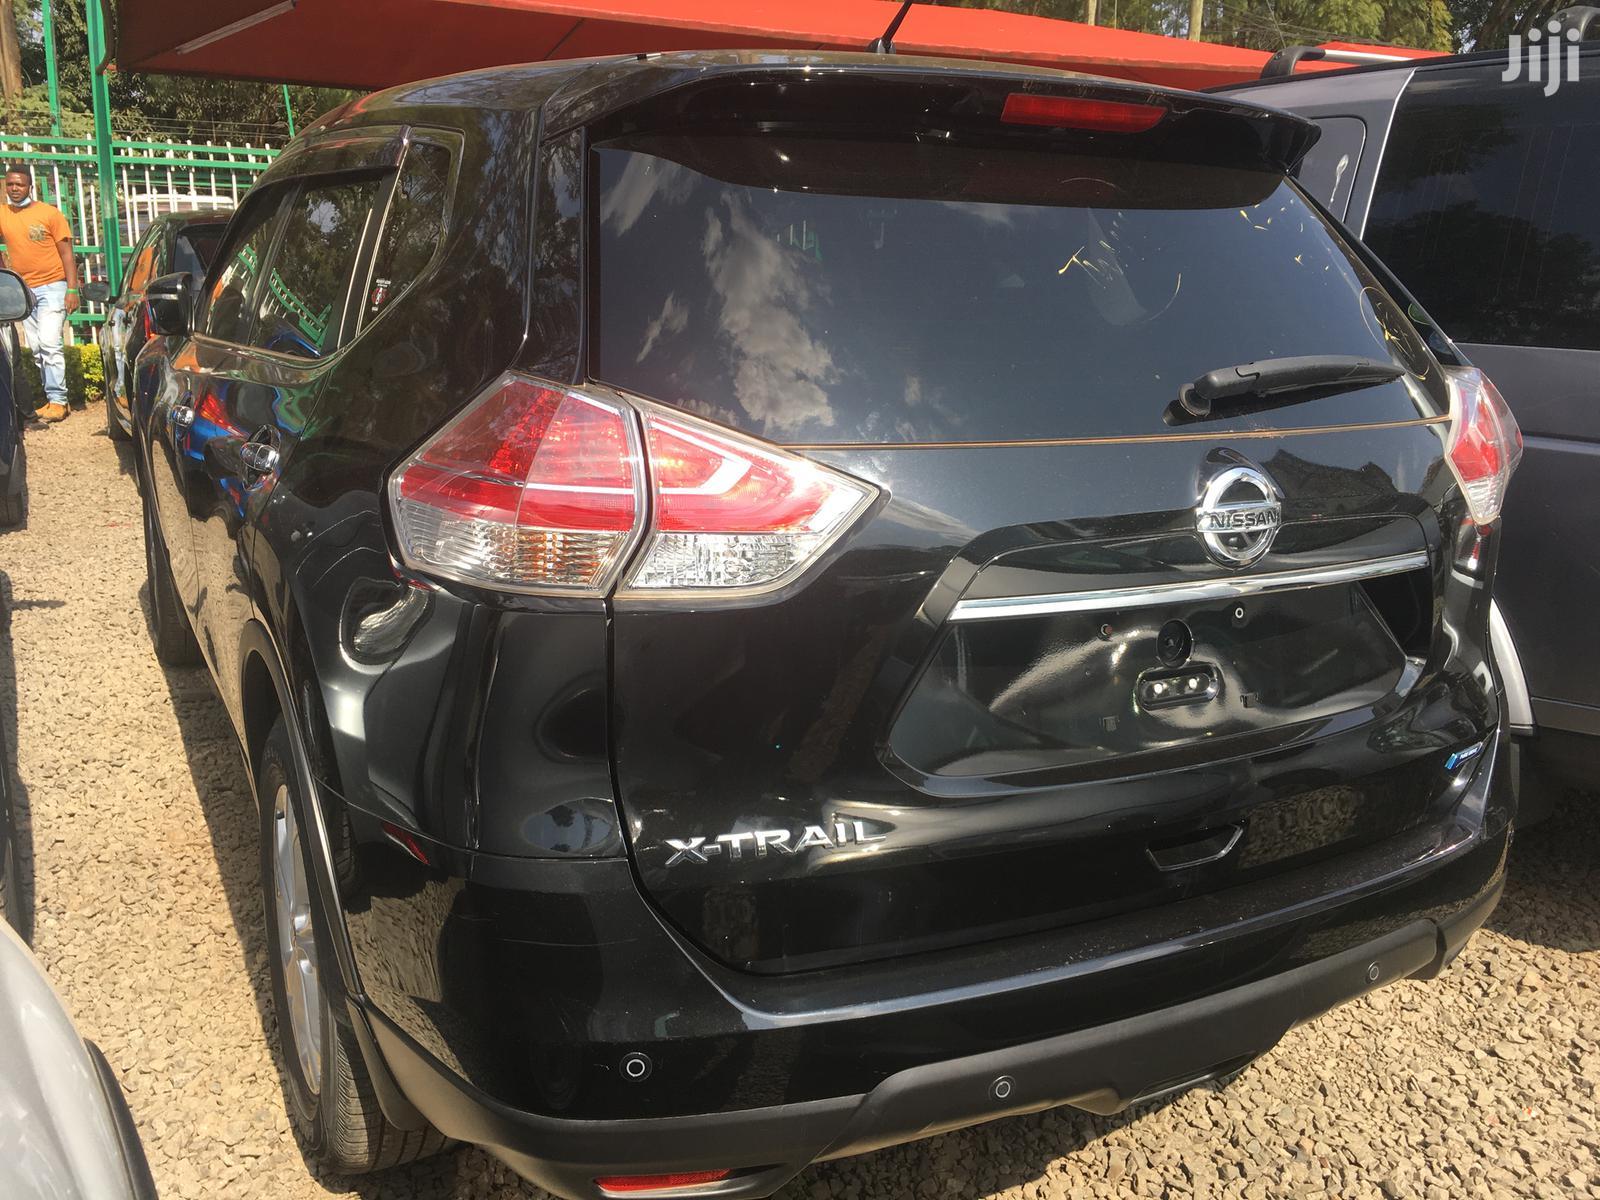 Nissan X-Trail 2014 Black | Cars for sale in Kilimani, Nairobi, Kenya